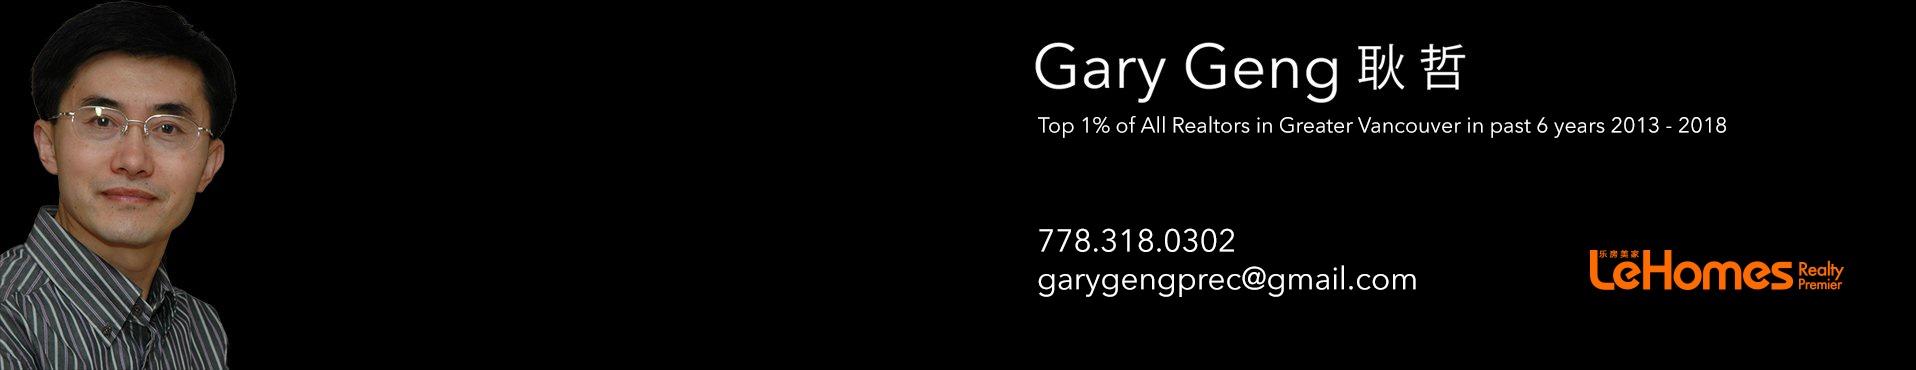 Gary Geng PREC*